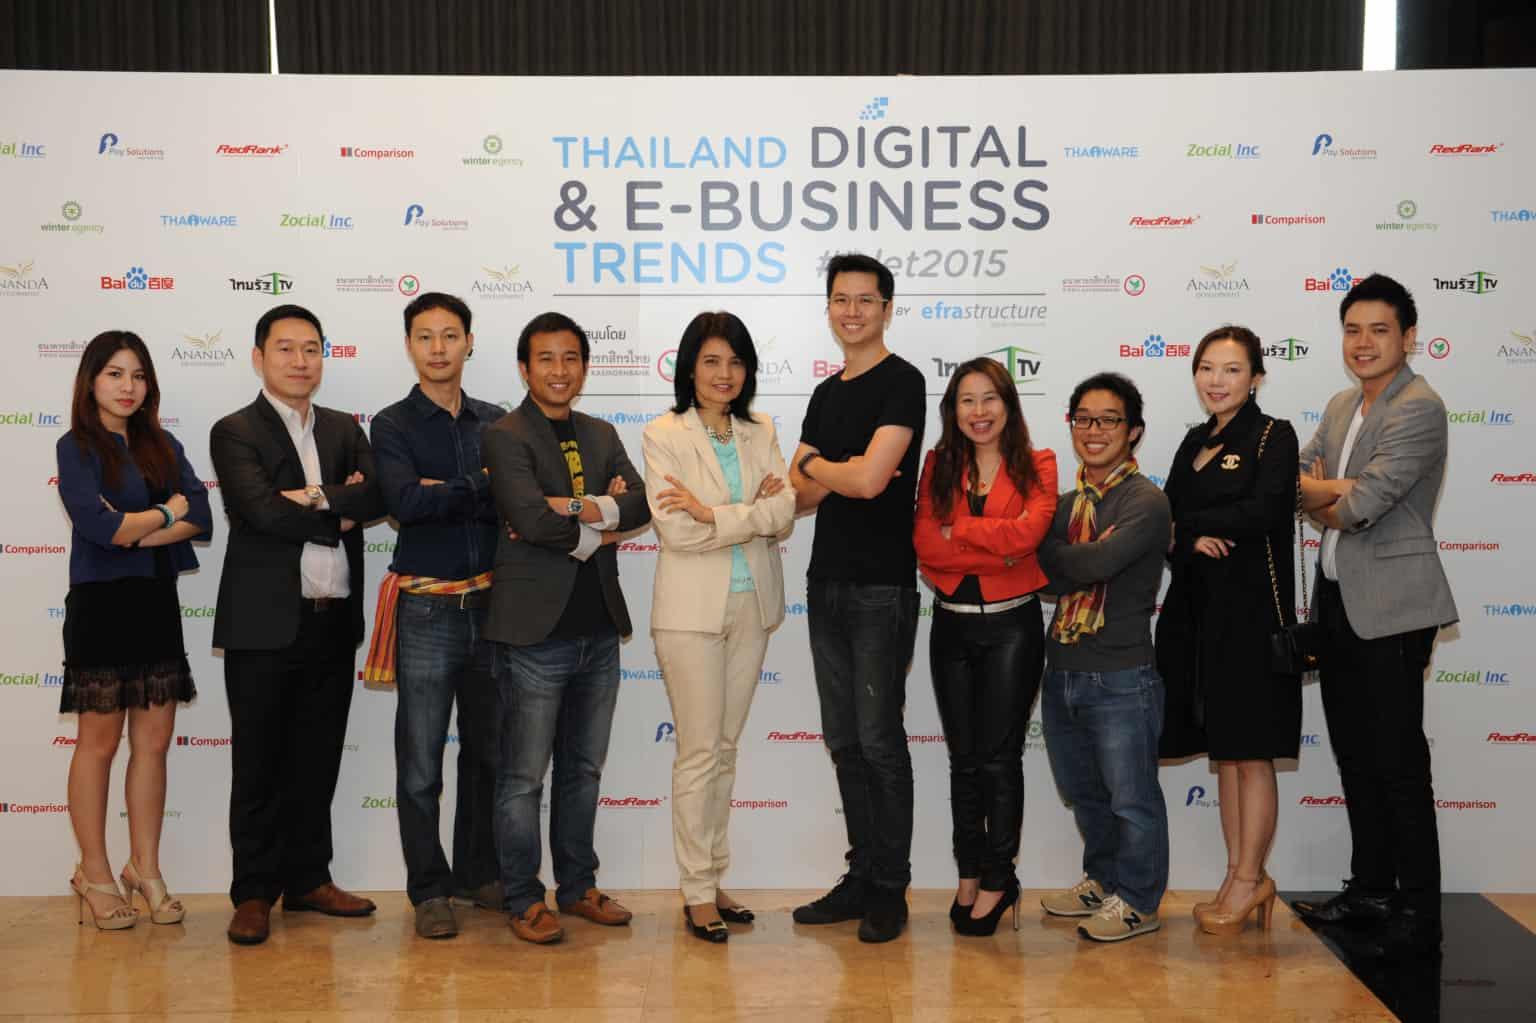 tdet-marketing-thai-trend-2015